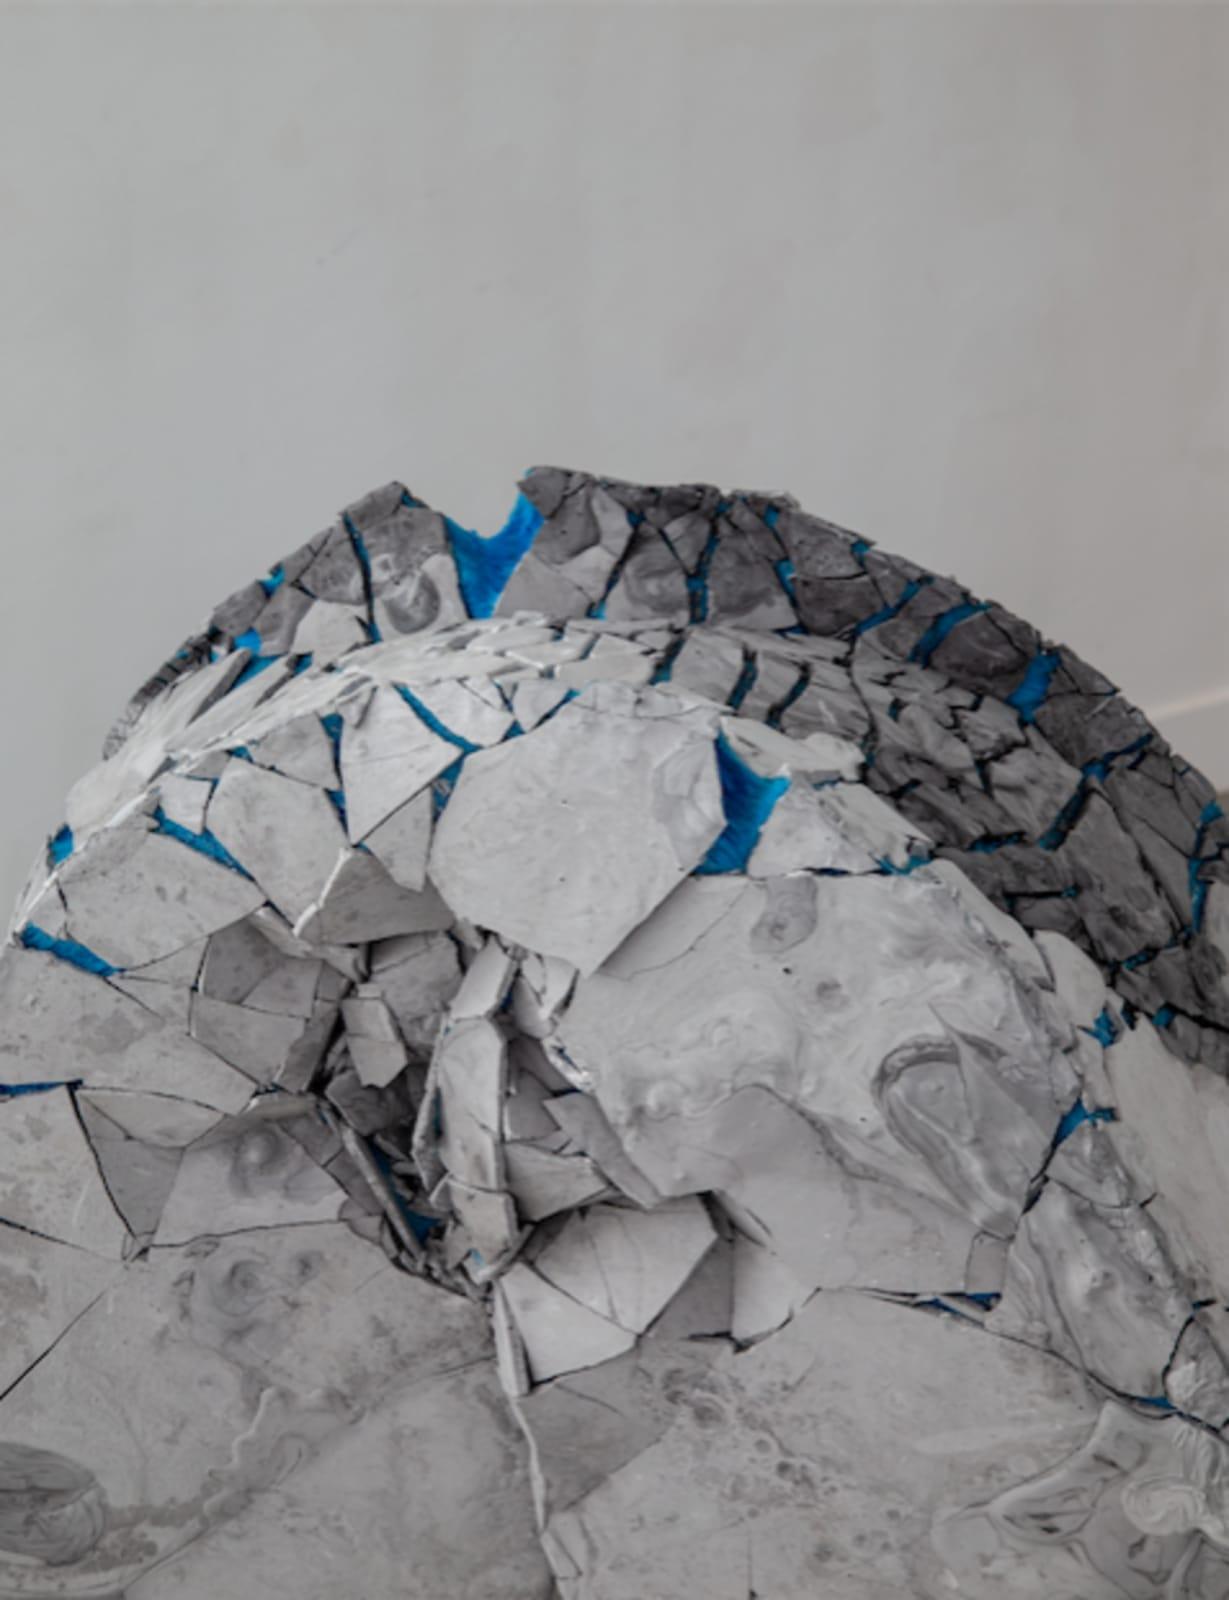 Reflections on Nature, Atousa Bandeh Ghiasabadi, Matea Bakula, Joseph Sassoon Semah,